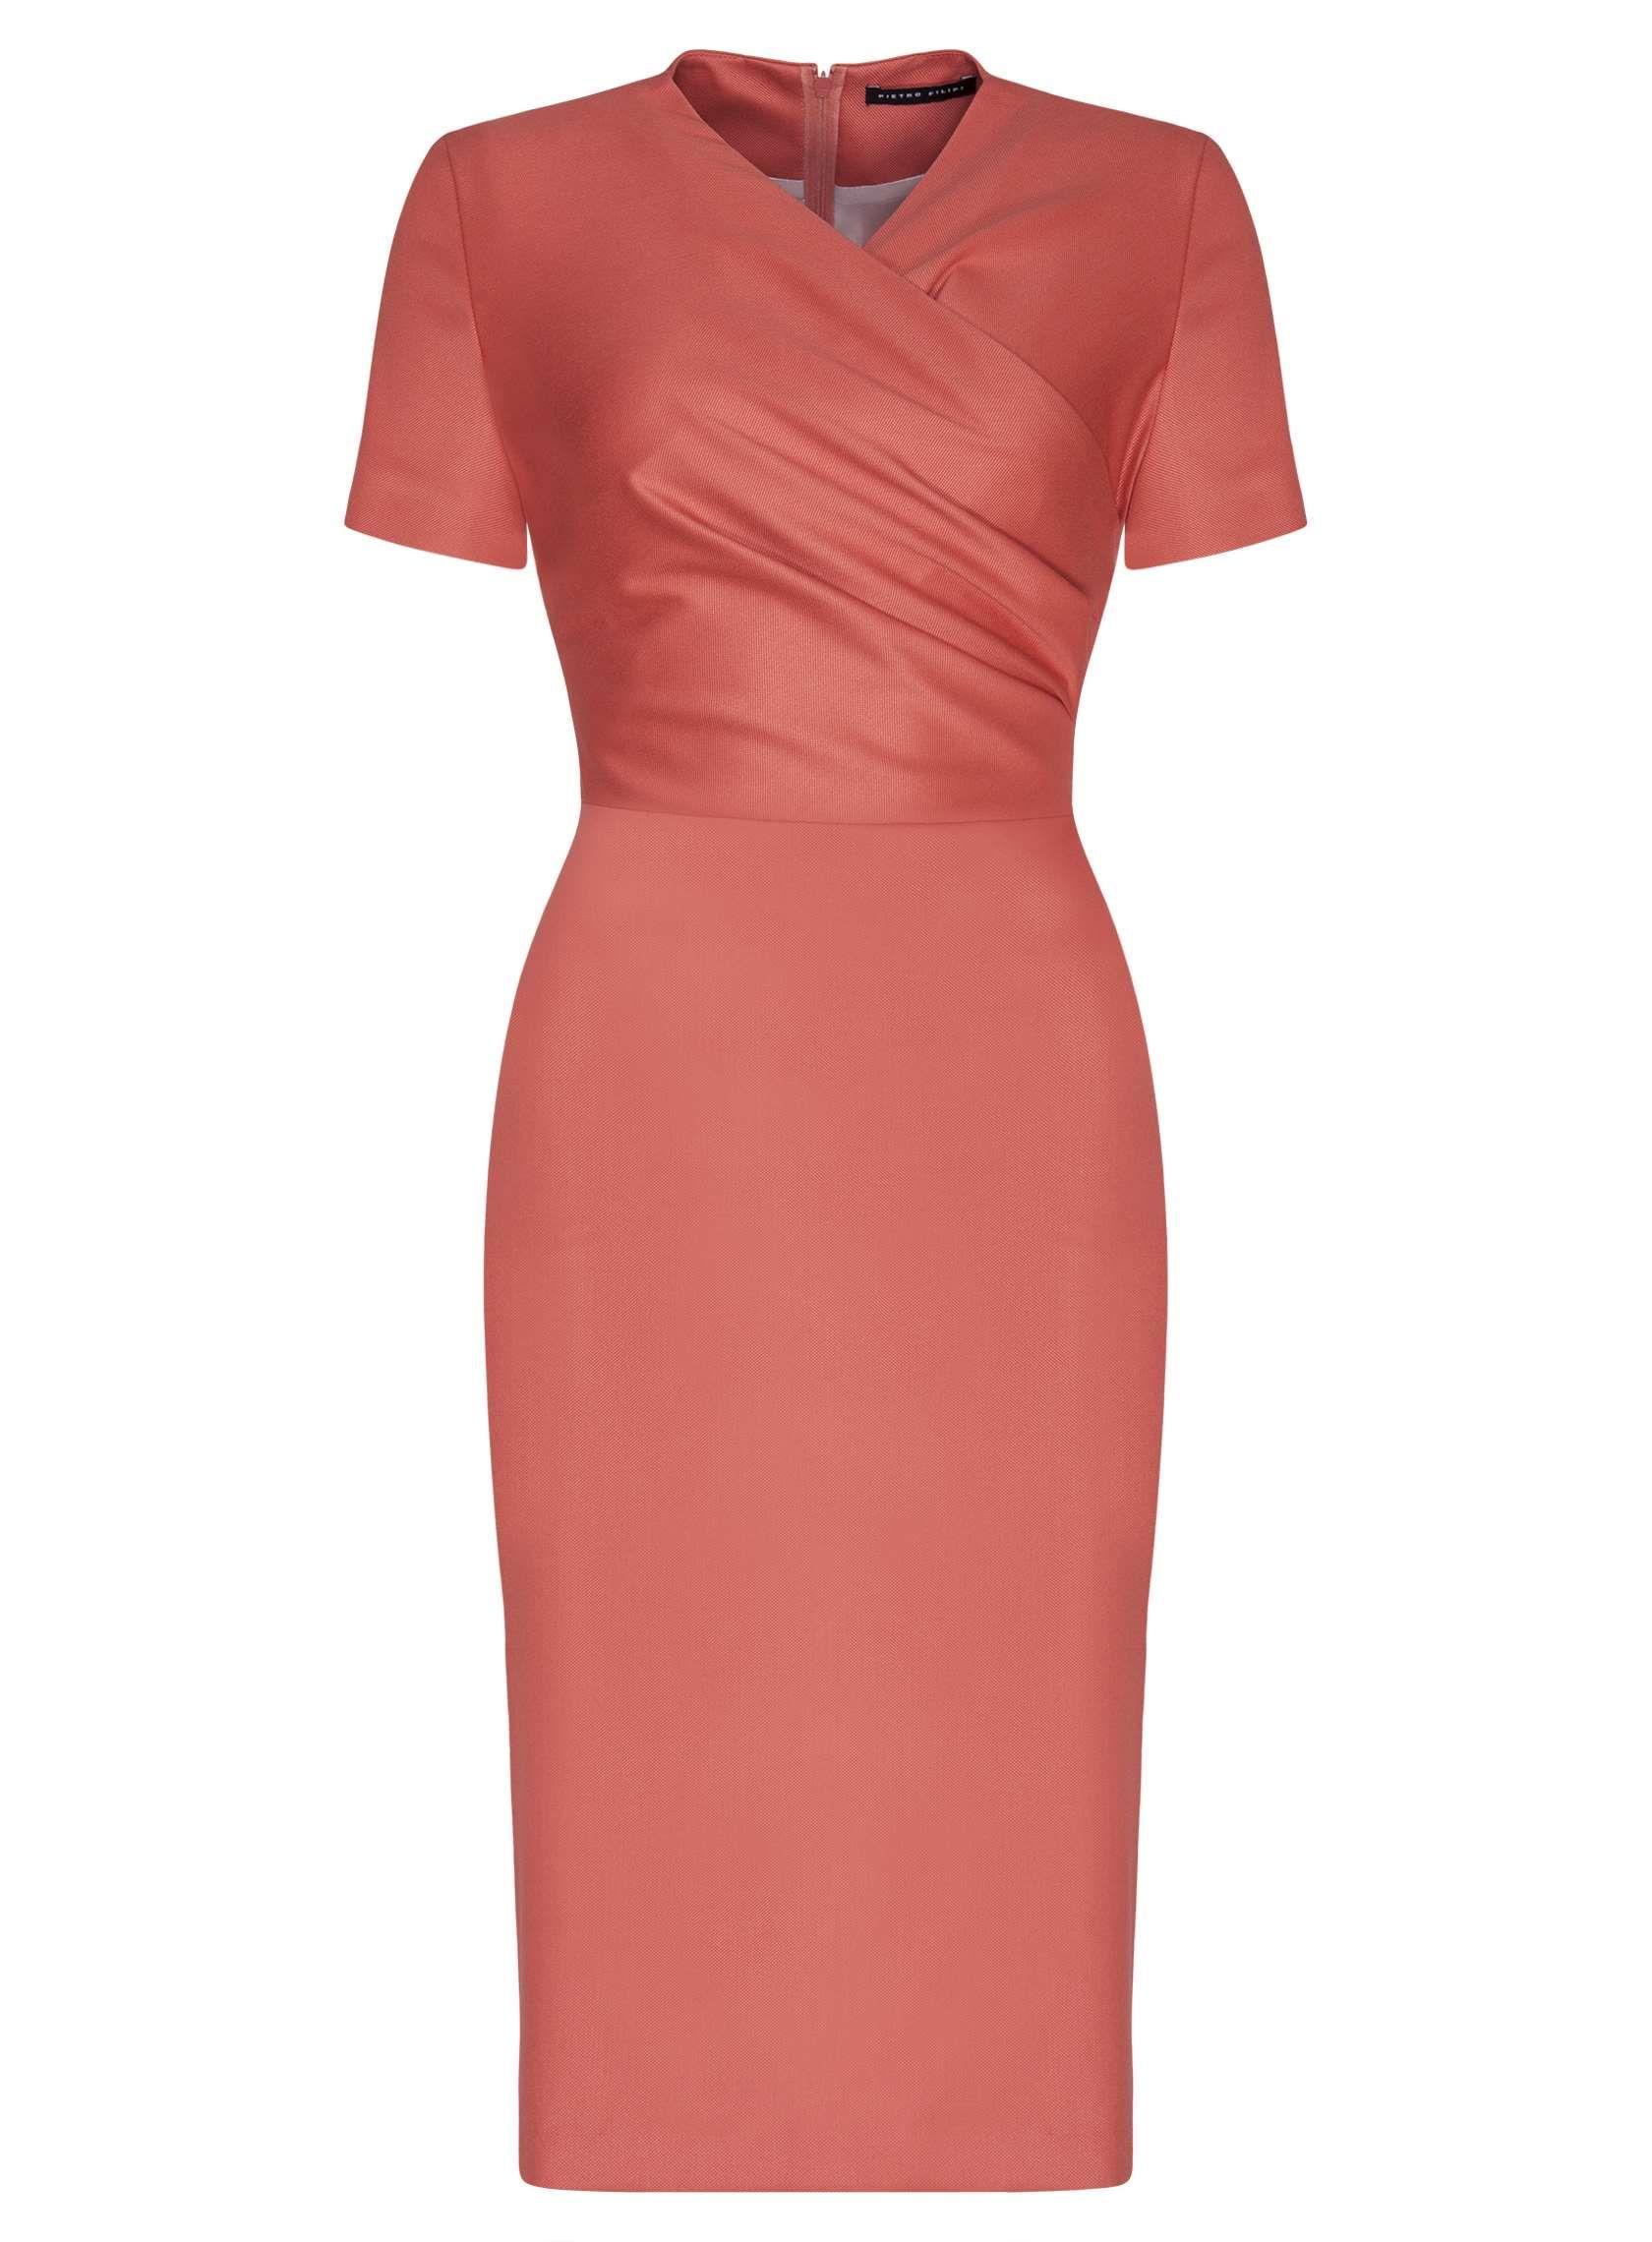 pietro filipi - Dámské šaty - DK5708092AGA  0a89b2f5c60